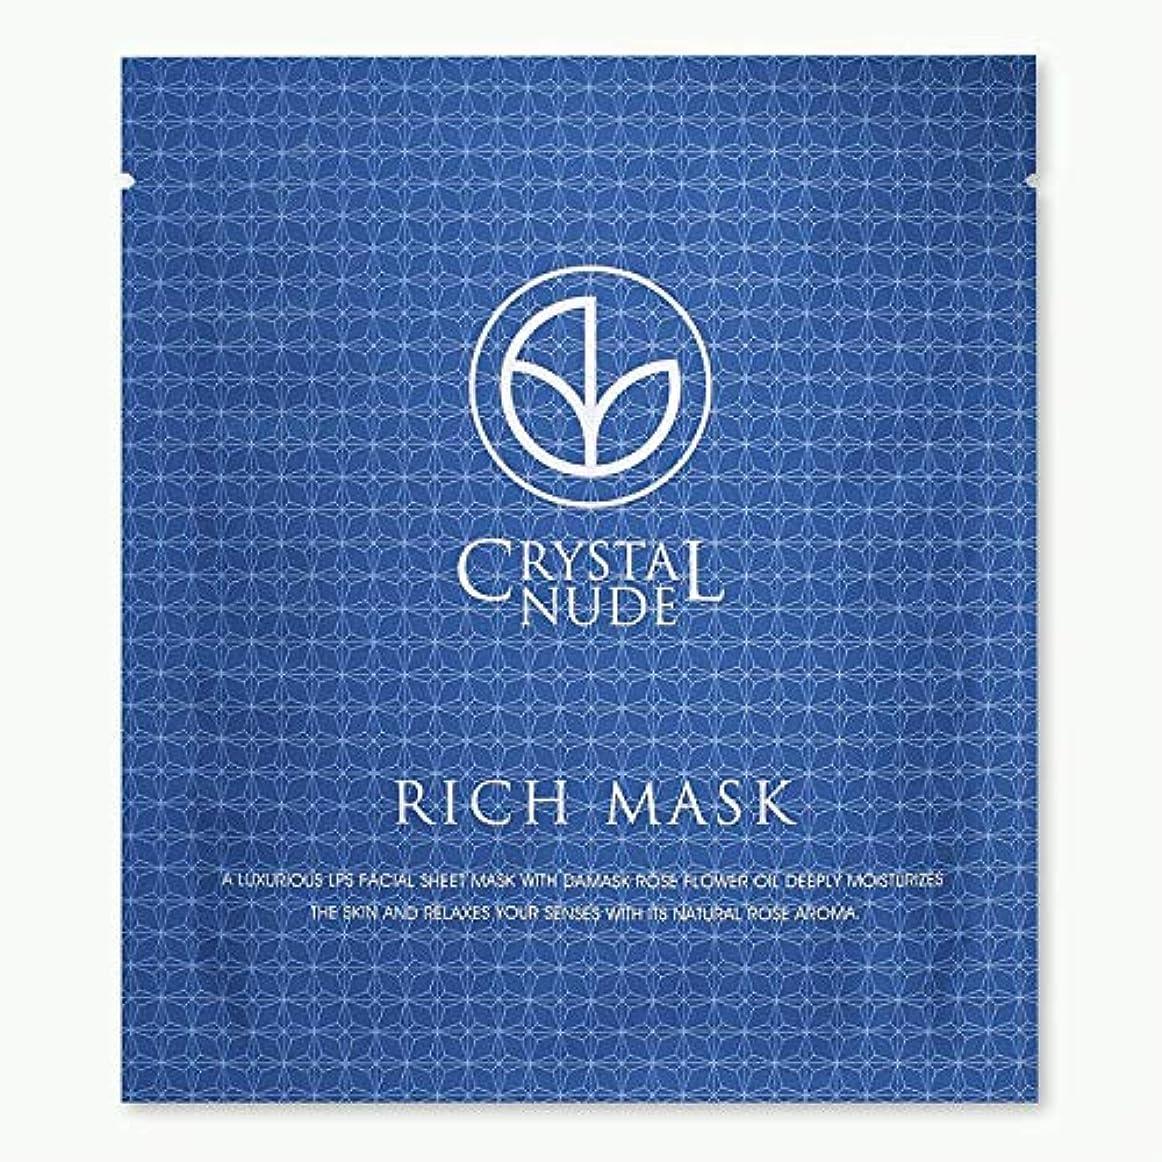 【LPS配合】RICH MASK リッチマスク (1枚)